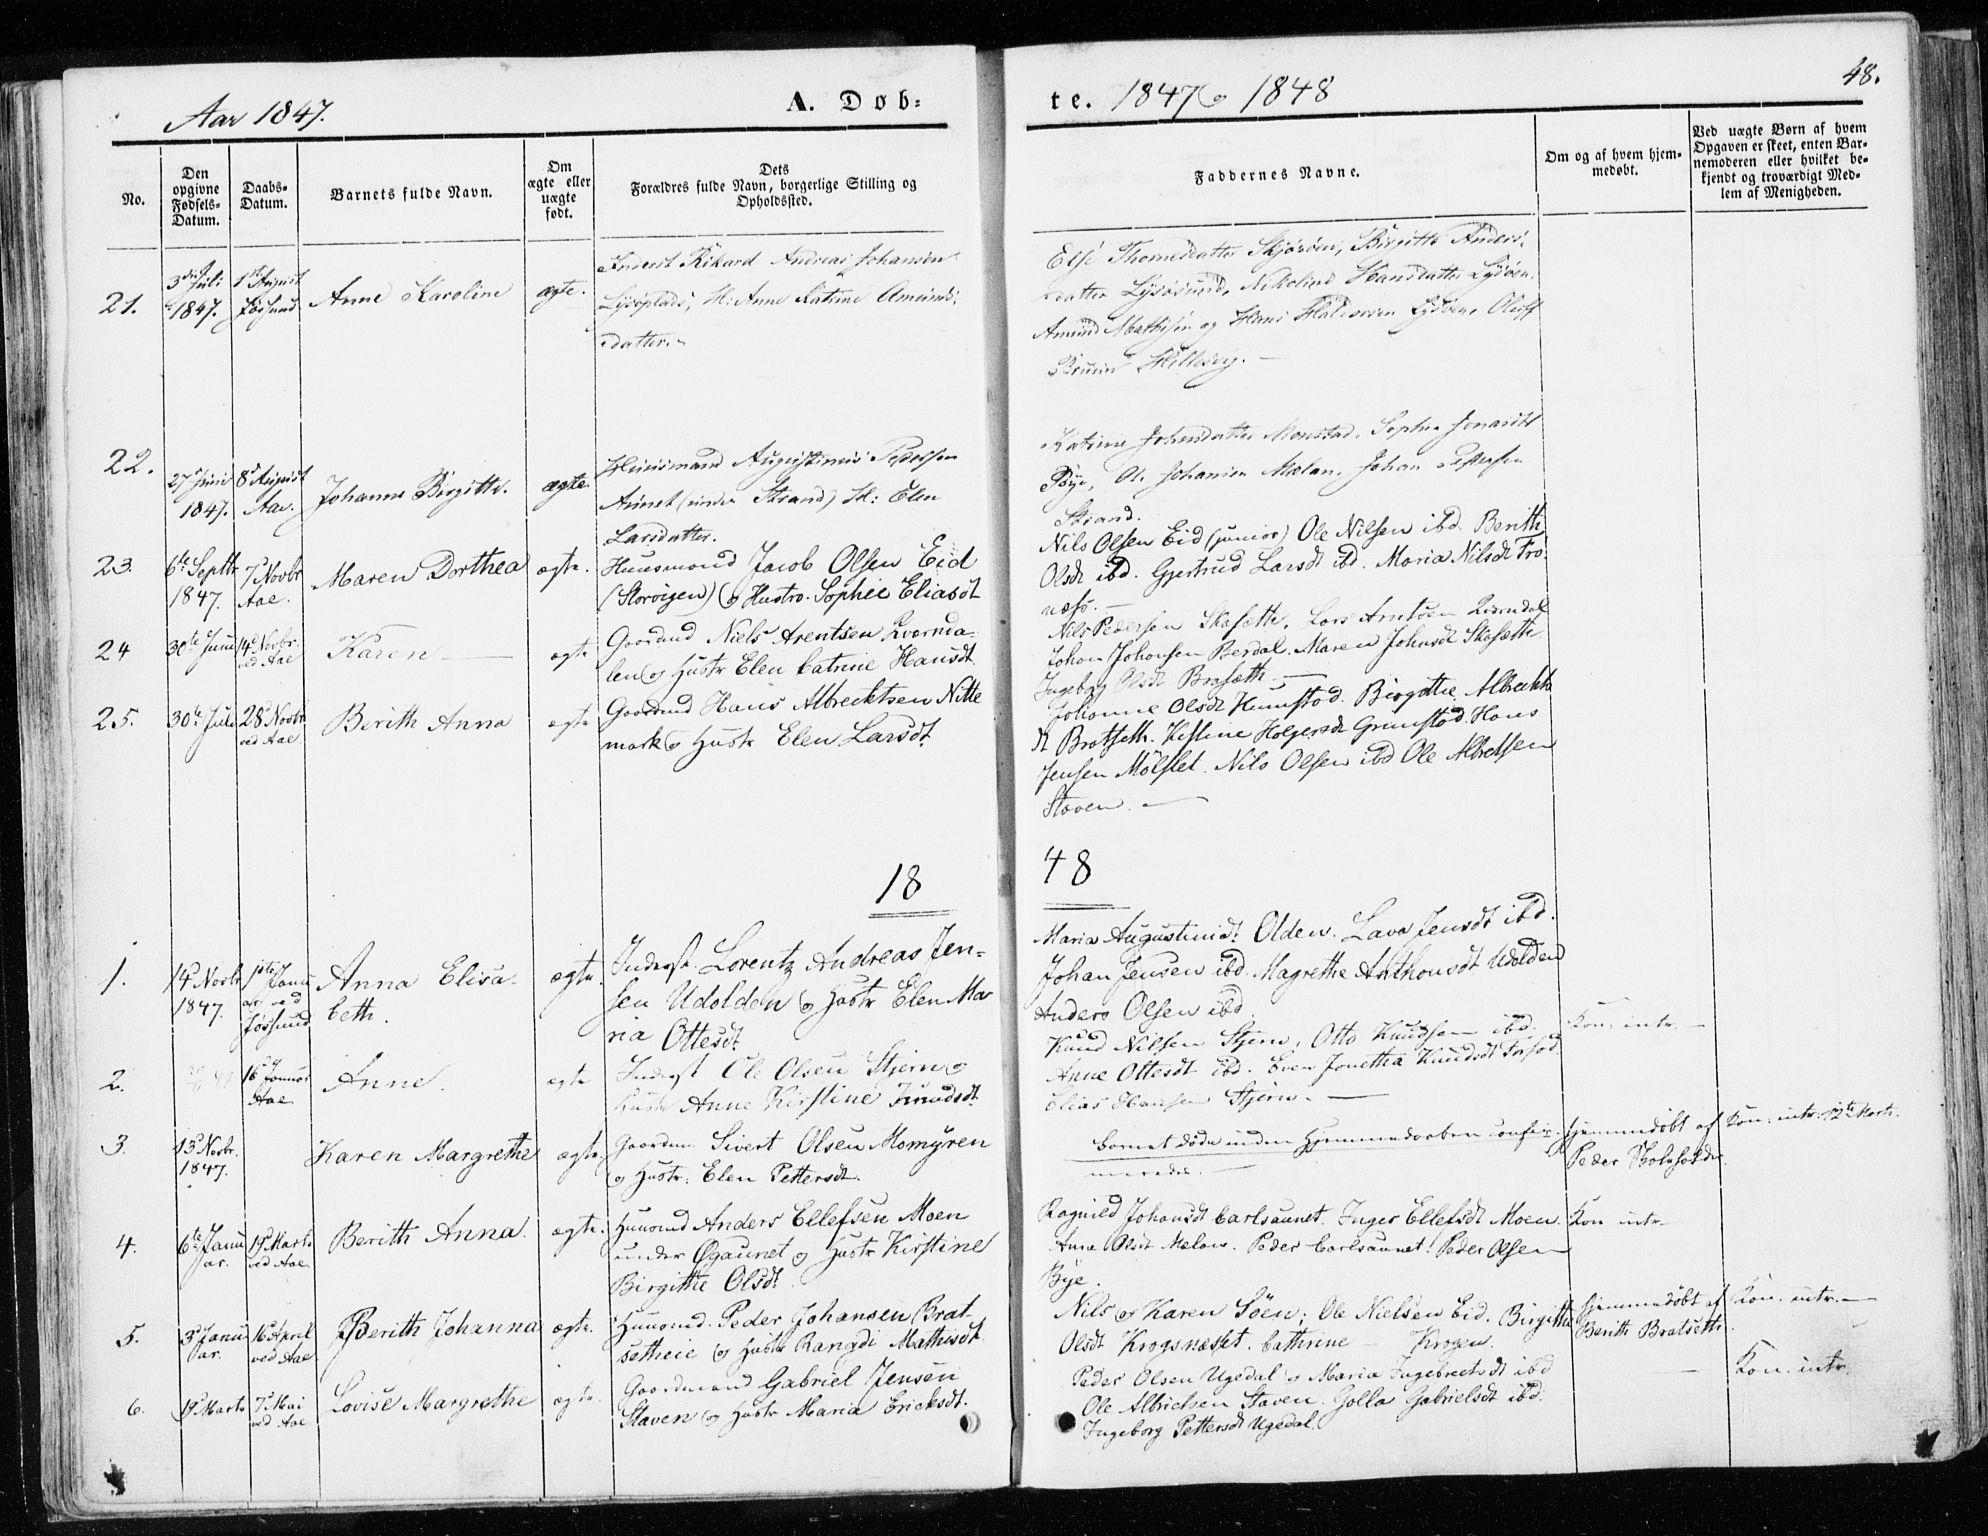 SAT, Ministerialprotokoller, klokkerbøker og fødselsregistre - Sør-Trøndelag, 655/L0677: Parish register (official) no. 655A06, 1847-1860, p. 48